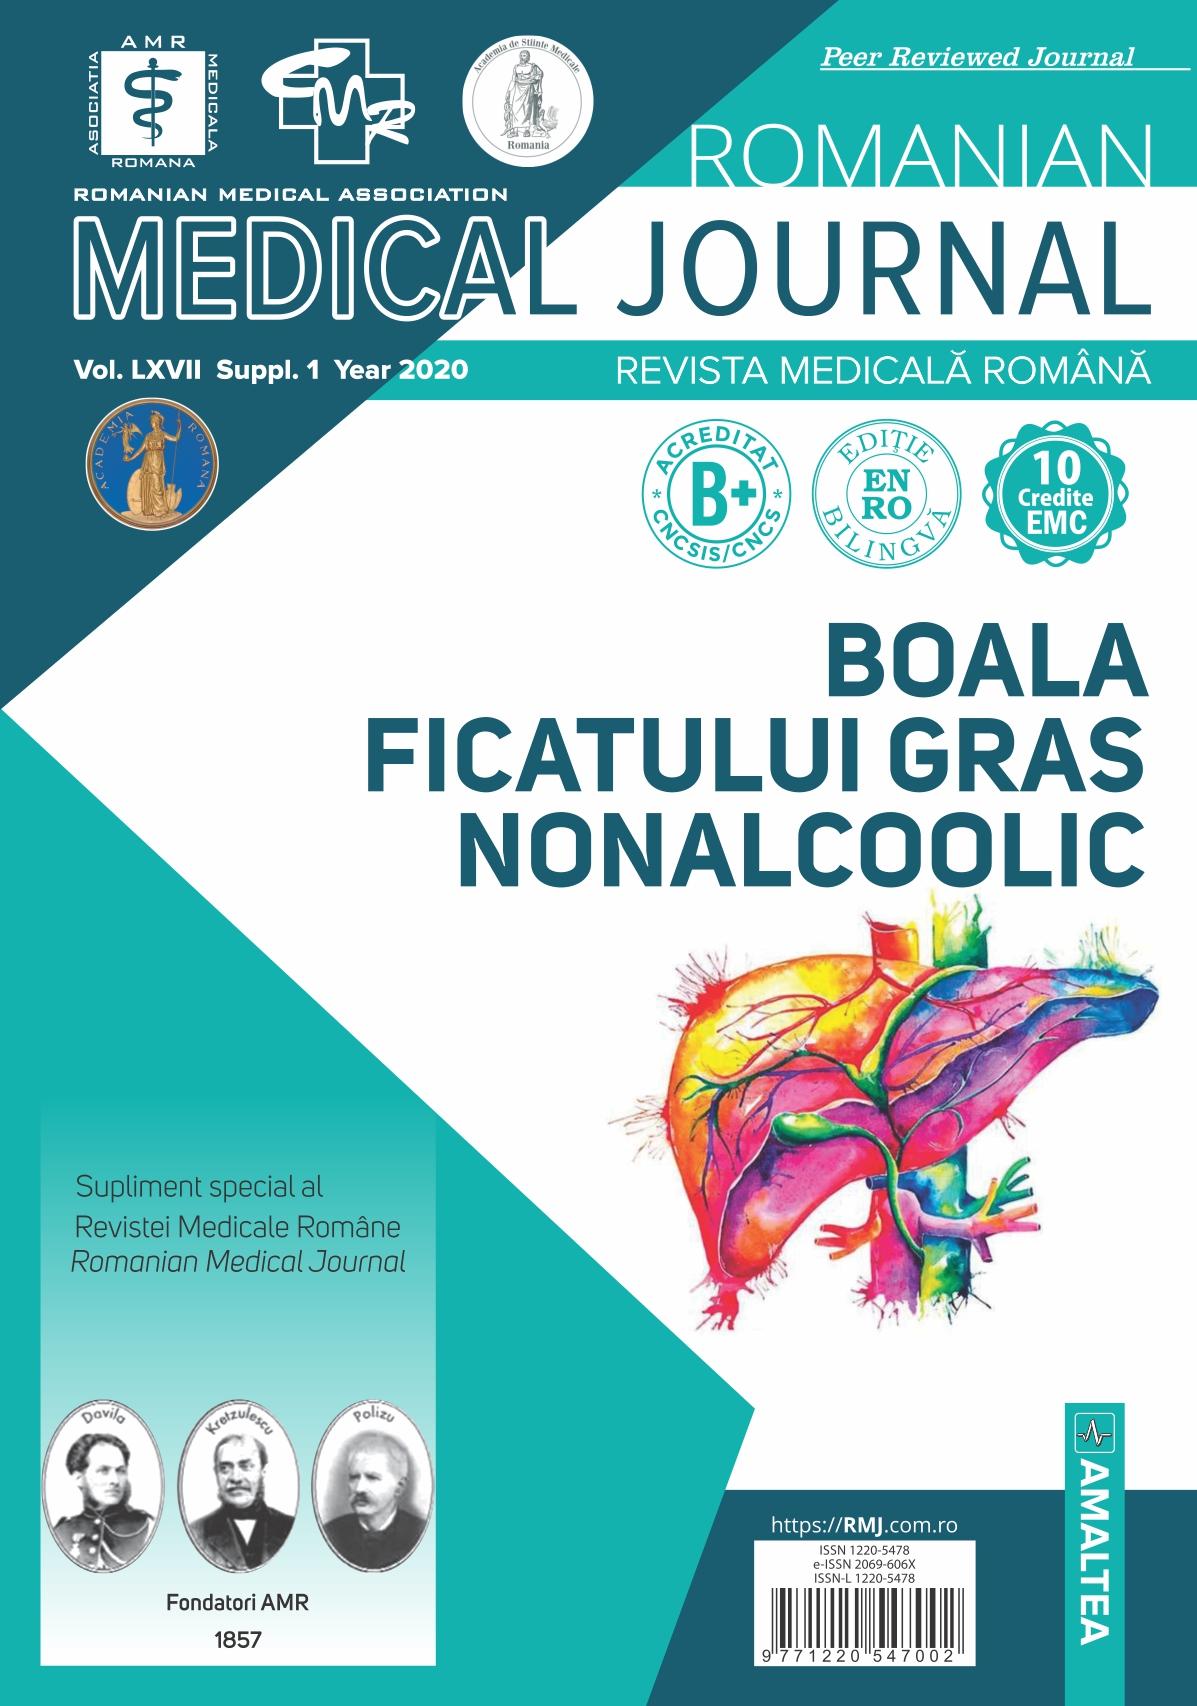 Romanian Medical Journal - REVISTA MEDICALA ROMANA, Vol. LXVII, Suppl., Year 2020